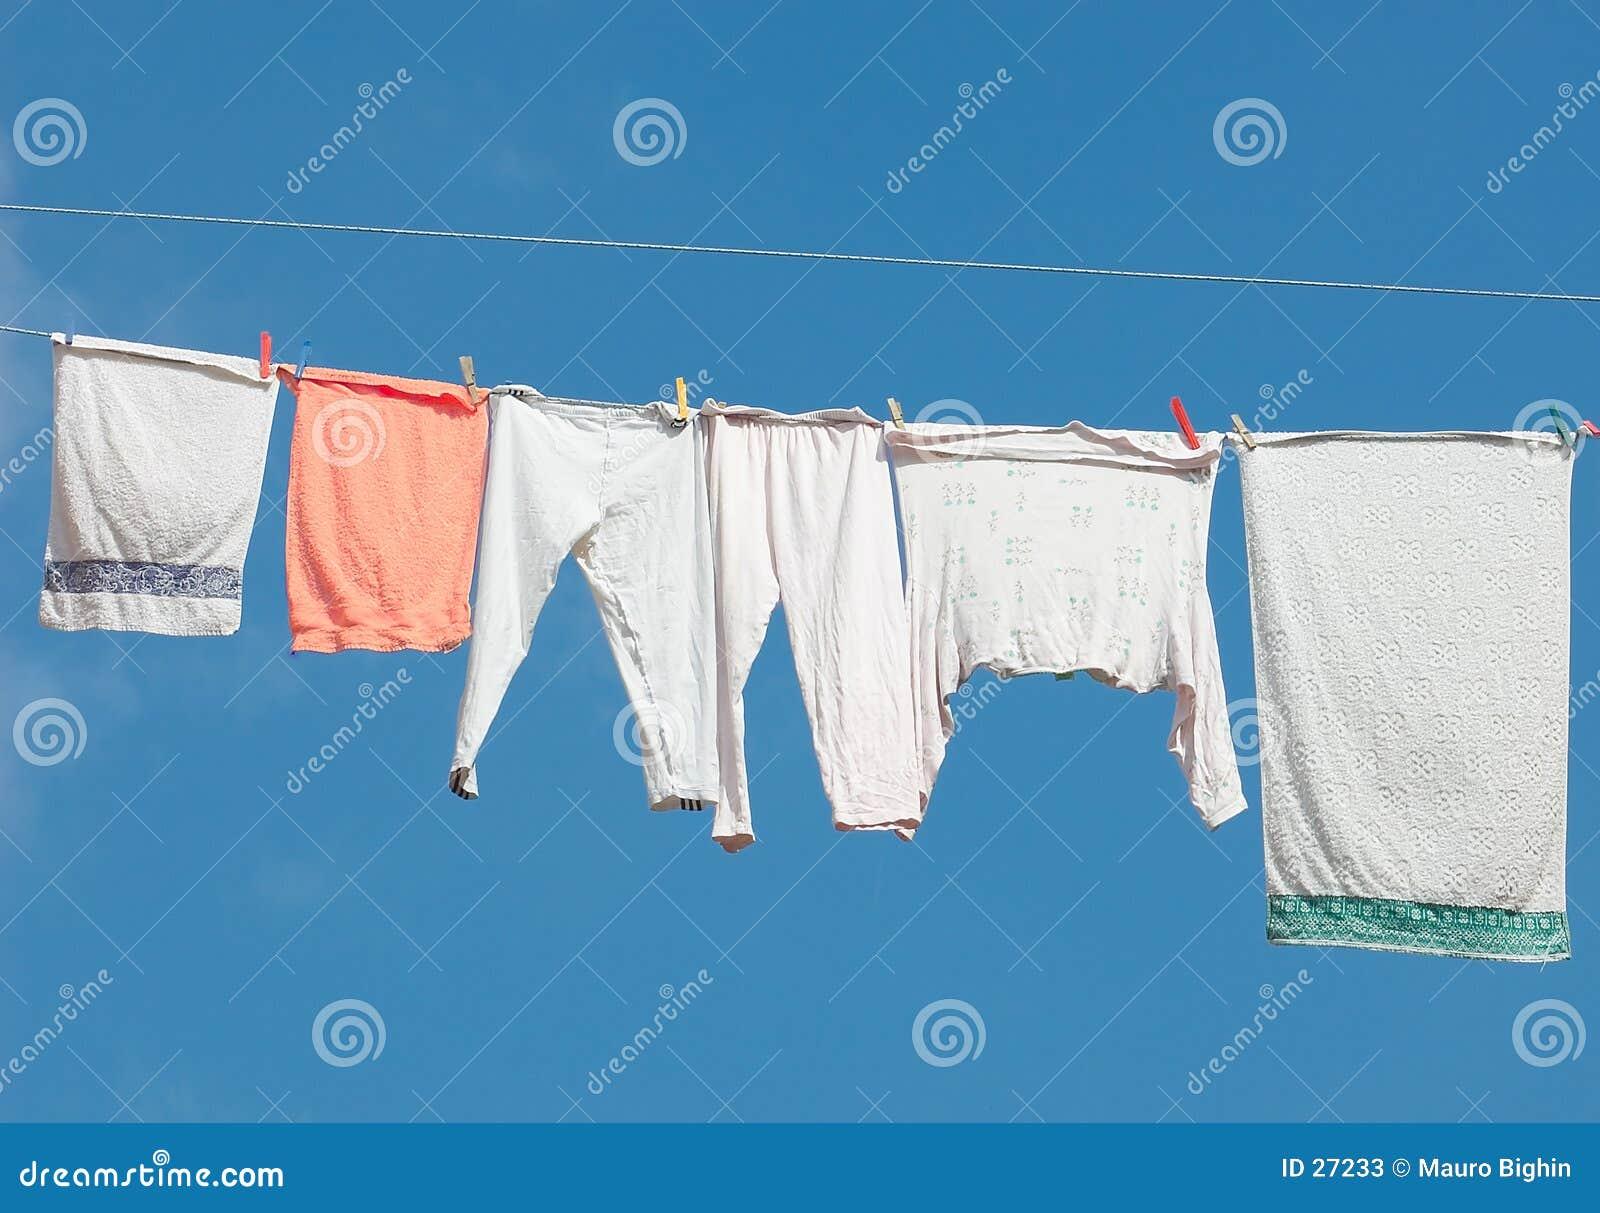 Hanging Washing Out Stock Photos Image 27233